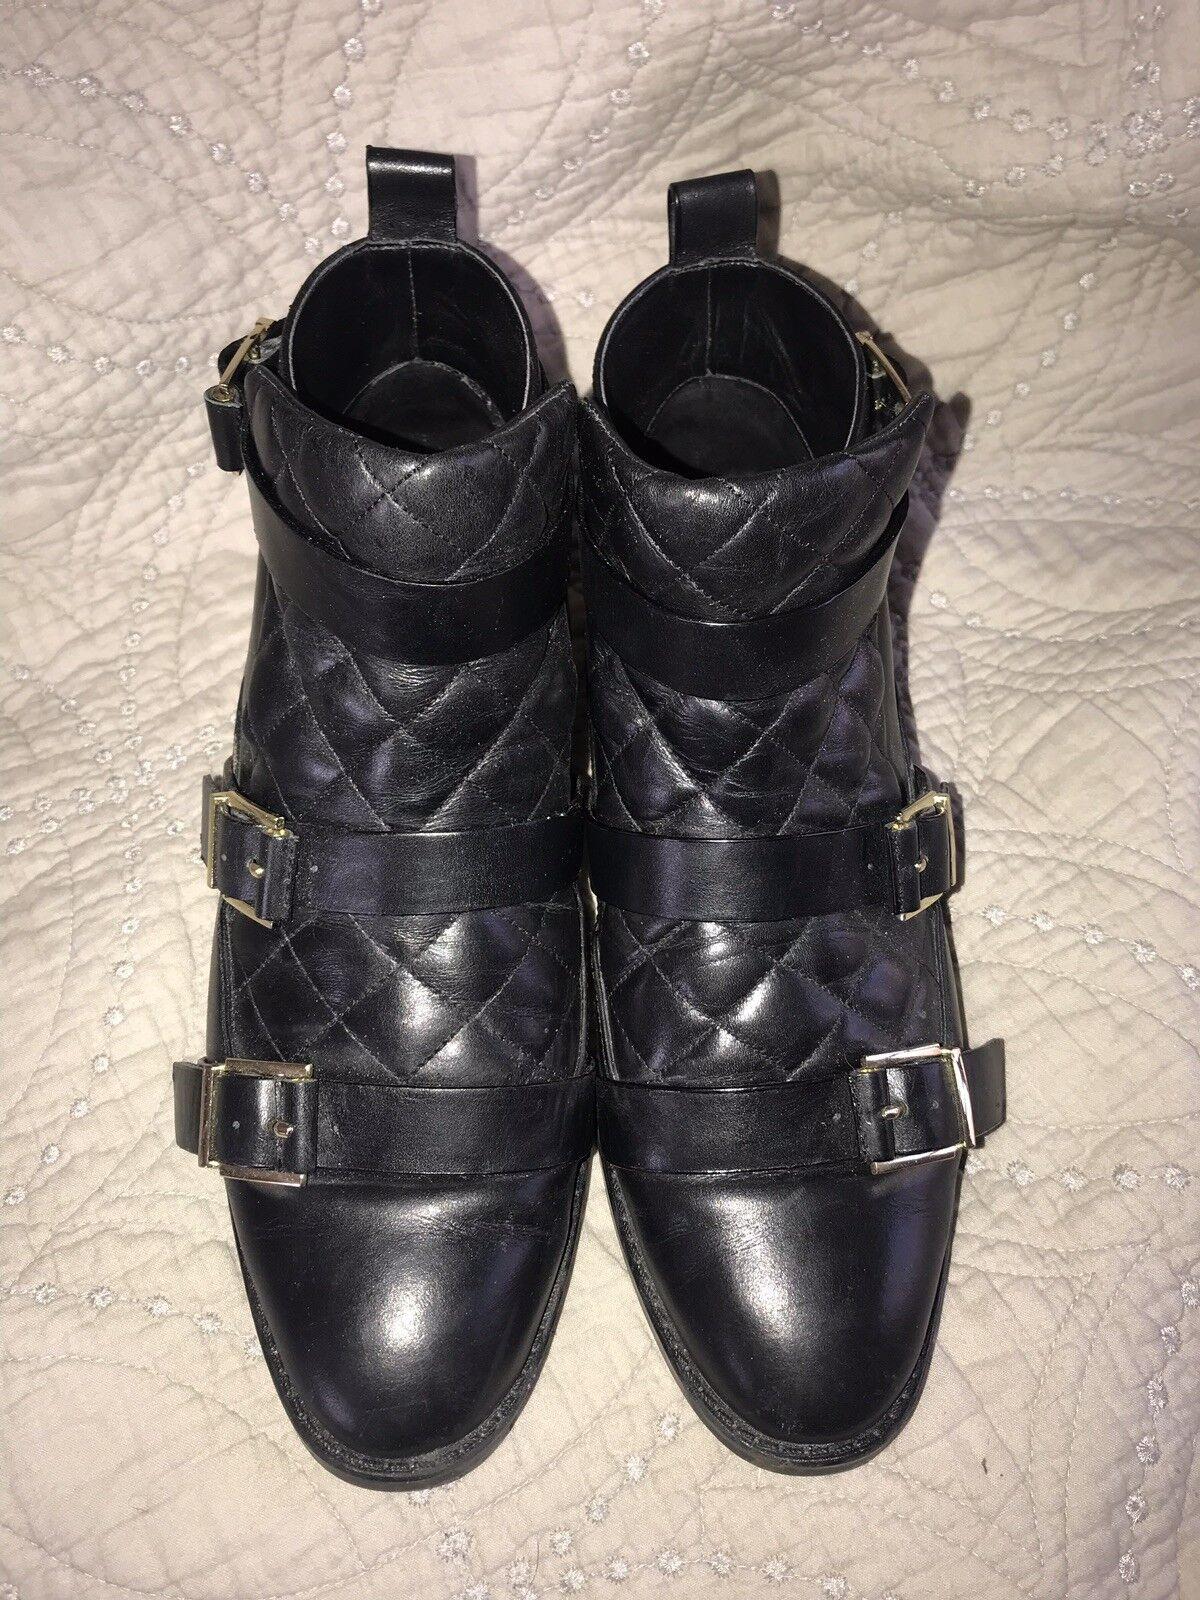 Zara Biker Hebilla Cuero Negro botas Bota de moto 40 euro 9 EE. UU.